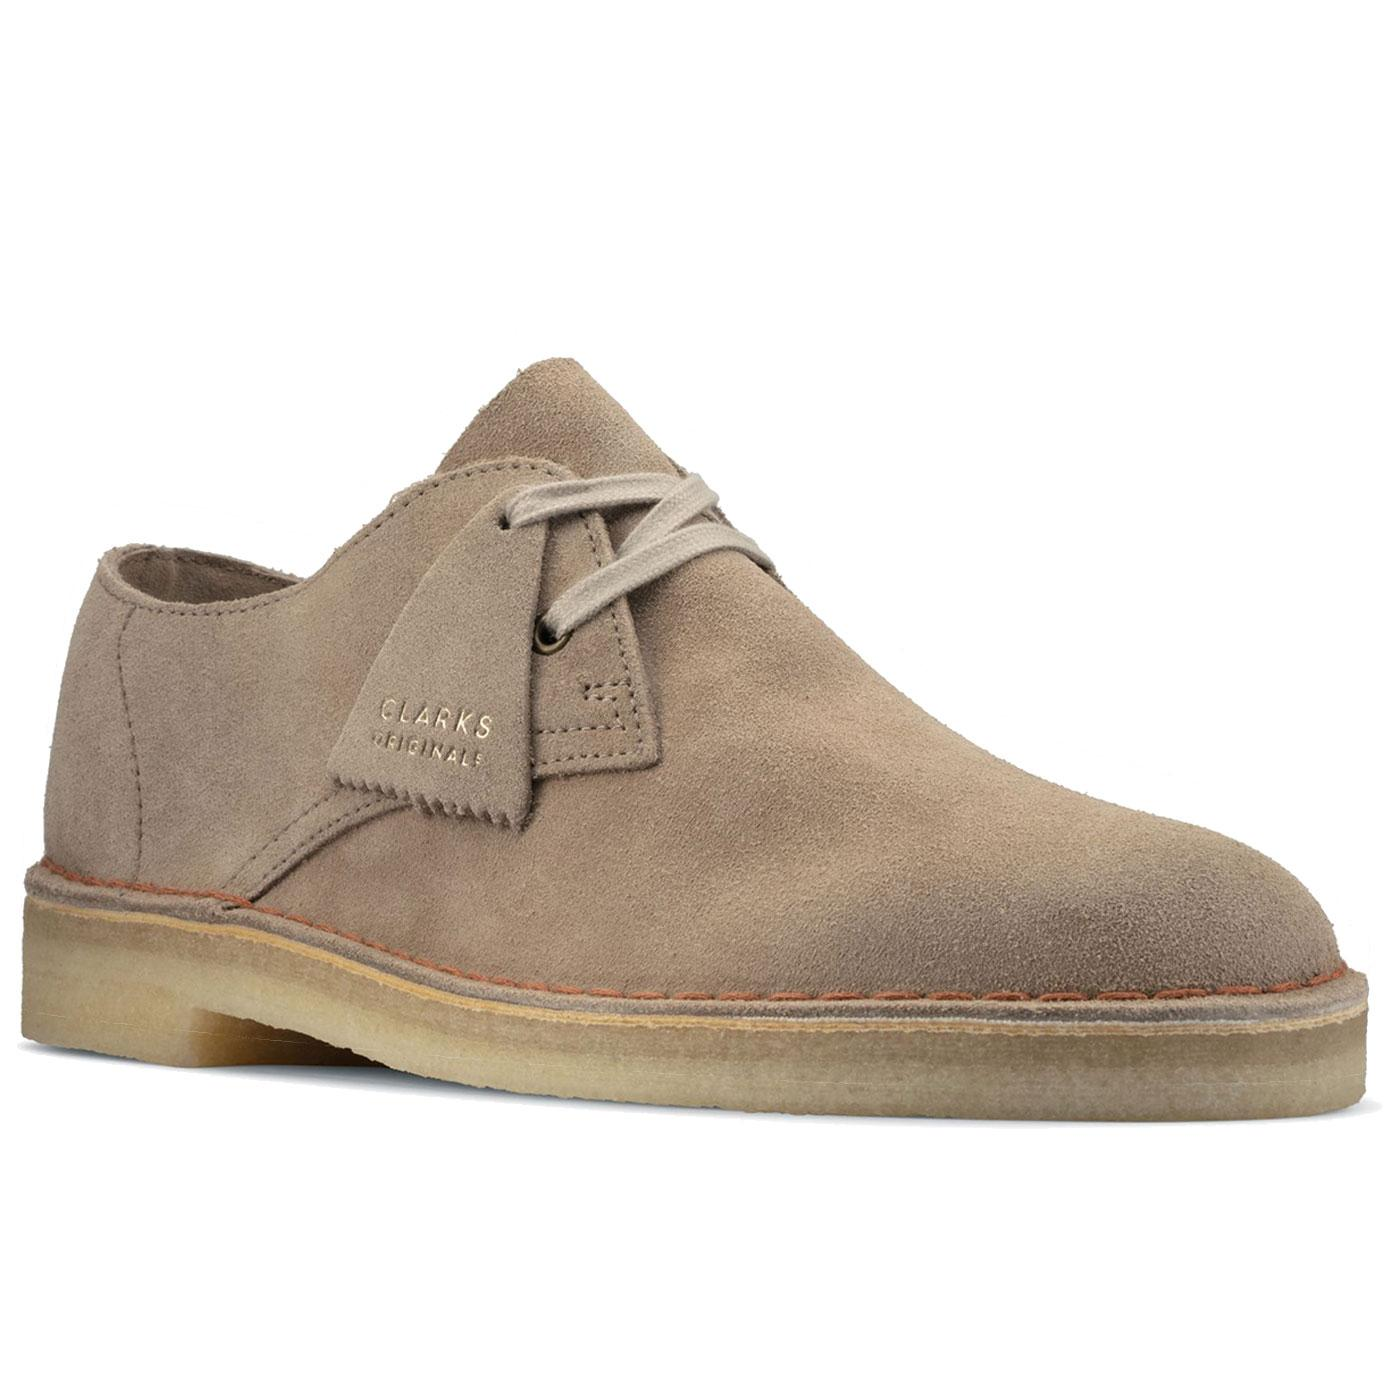 Desert Khan Clarks Originals Suede Oxford Shoes S